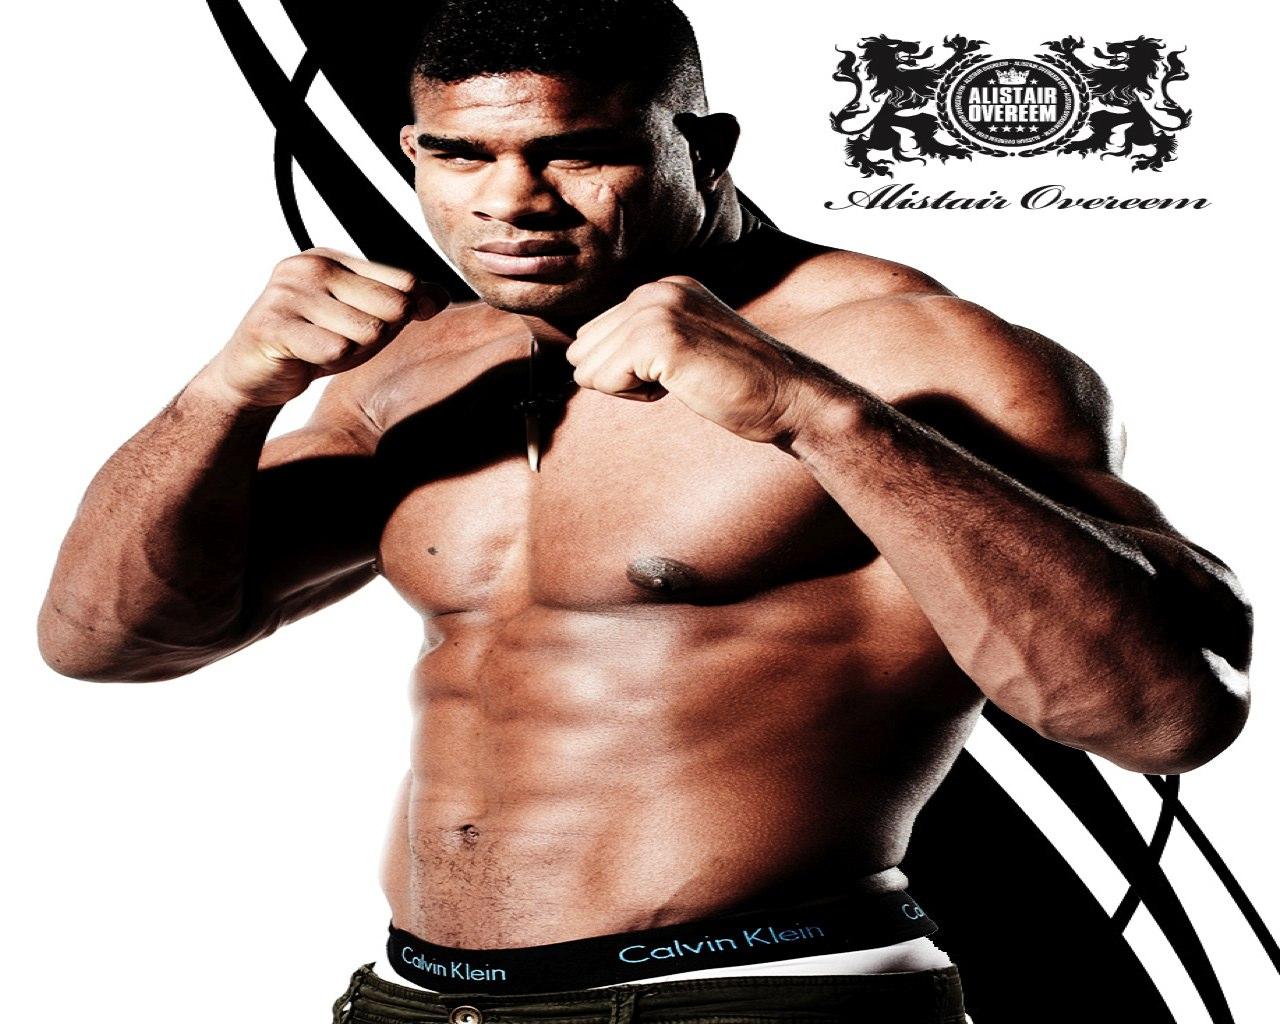 Mma Fight Opinion Alistair Overeem 2010 K 1 Grand Prix Champion